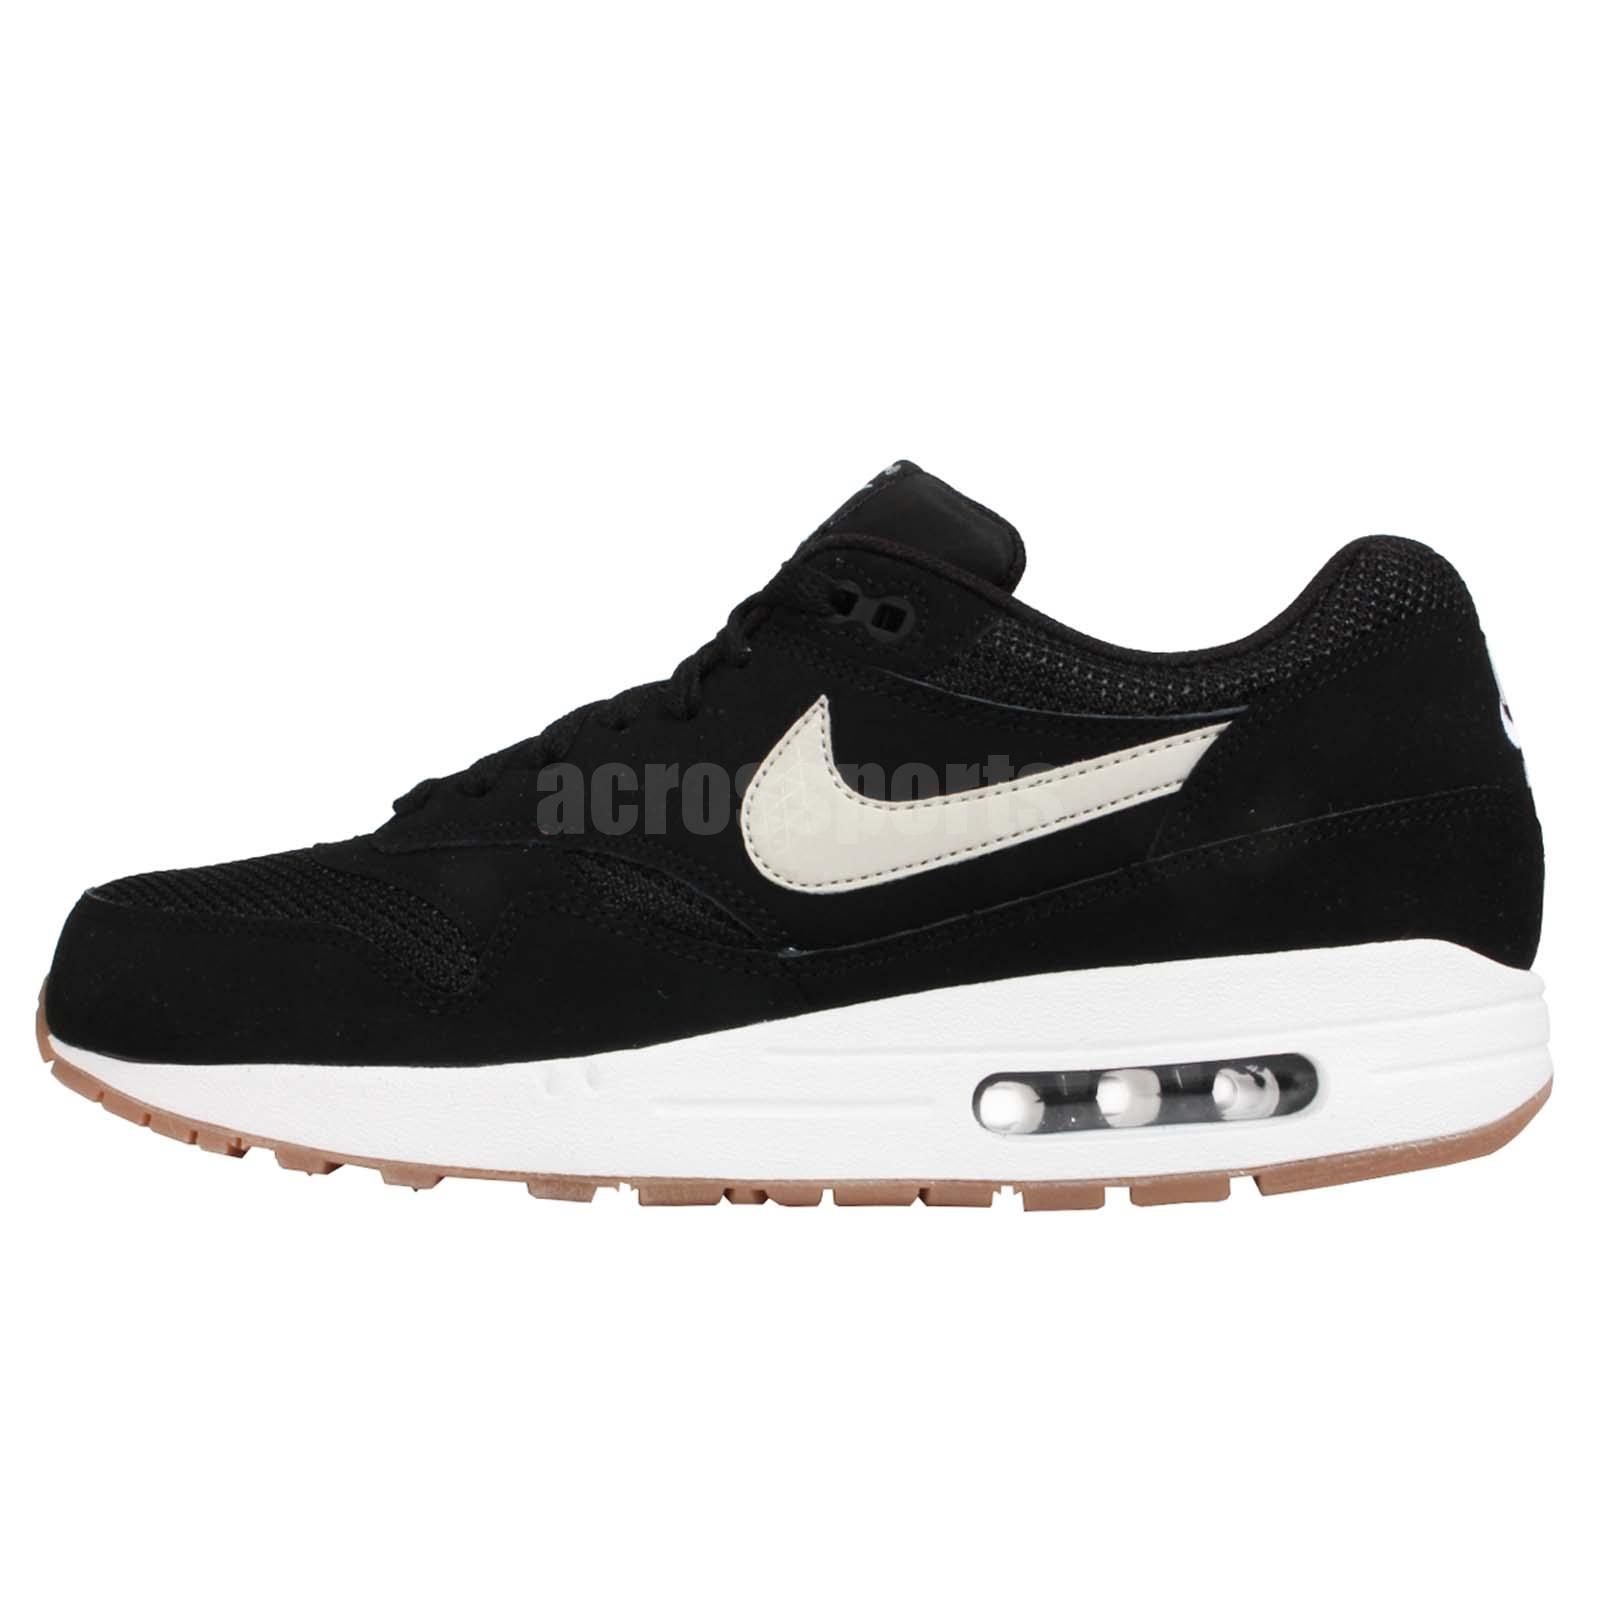 nike air max 1 light bone ebay Shoes black ...